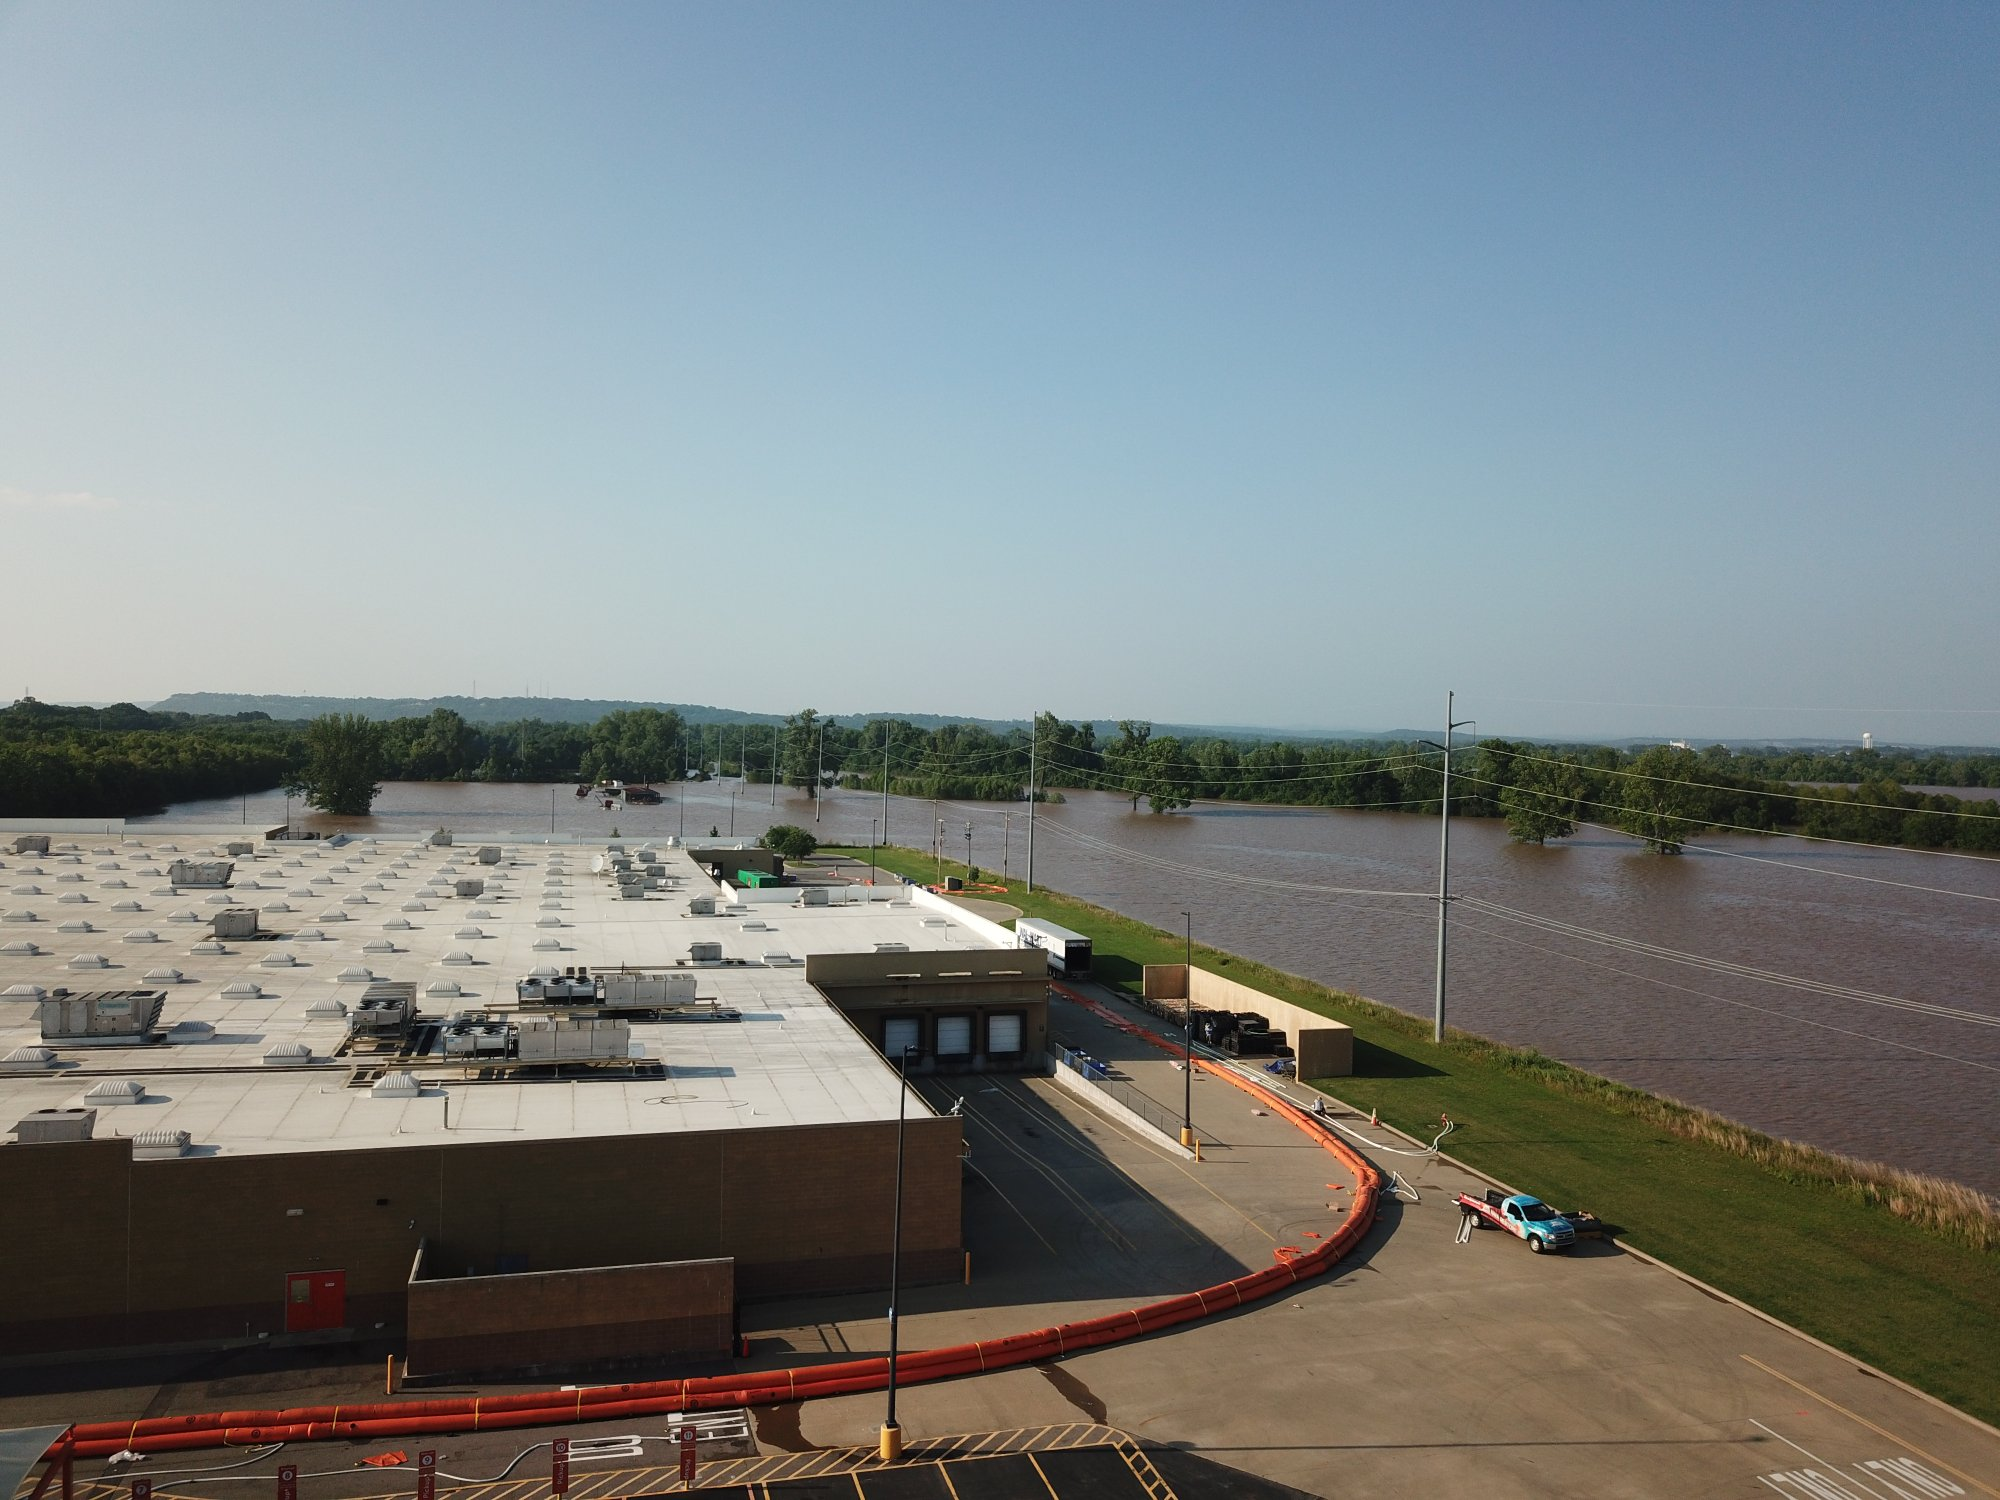 Kelley Highway Walmart (Courtesy of Gary Norman)